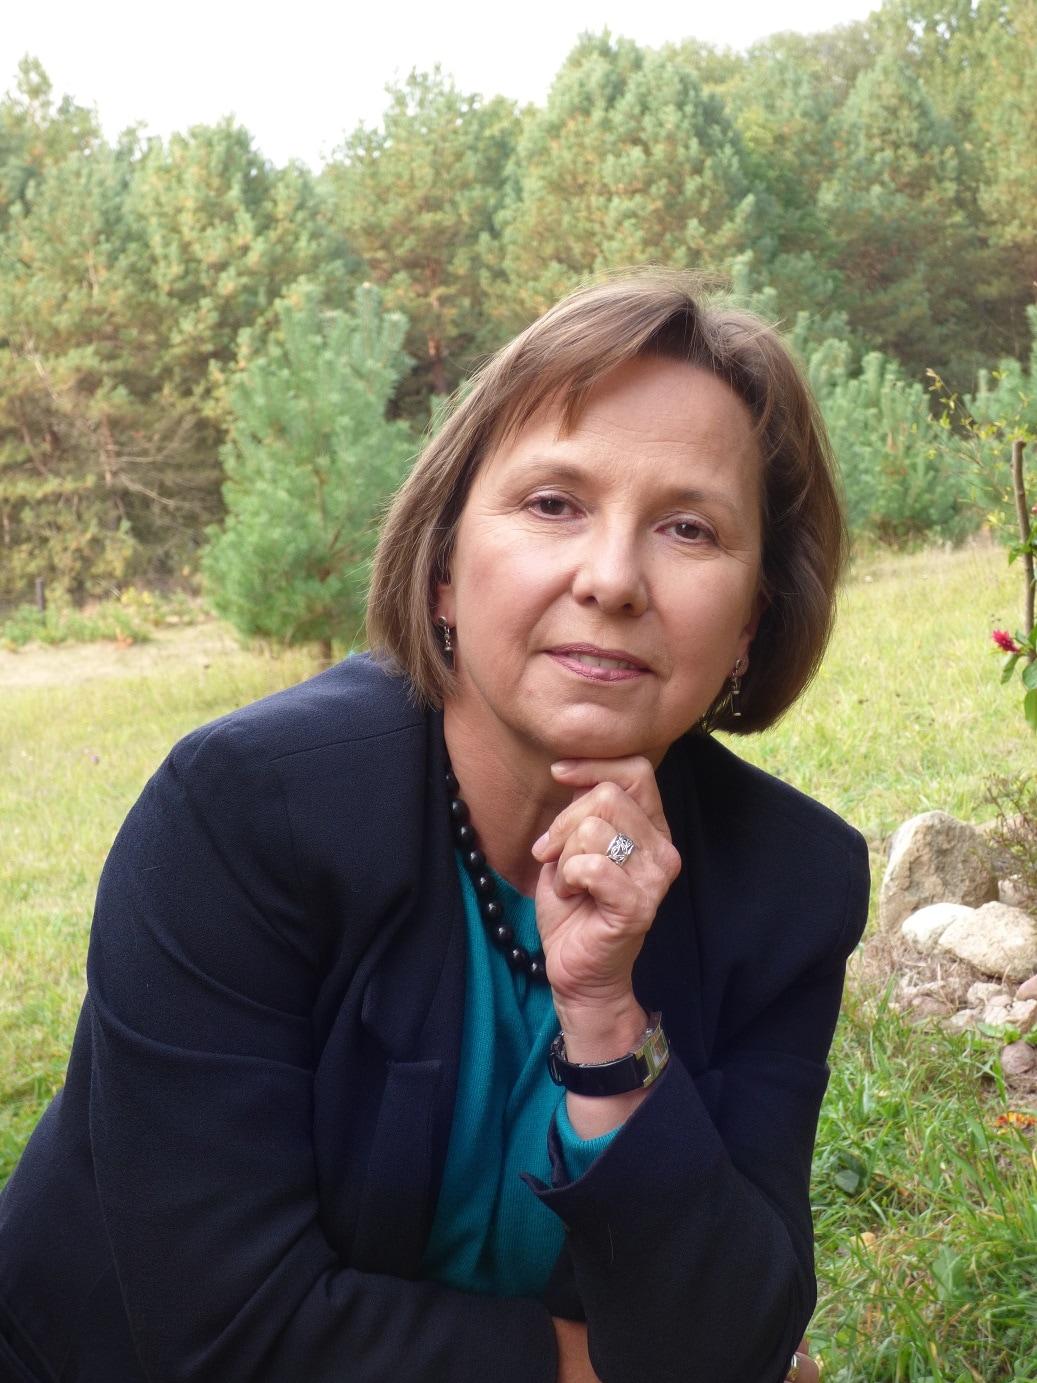 Jola From Warsaw, Poland